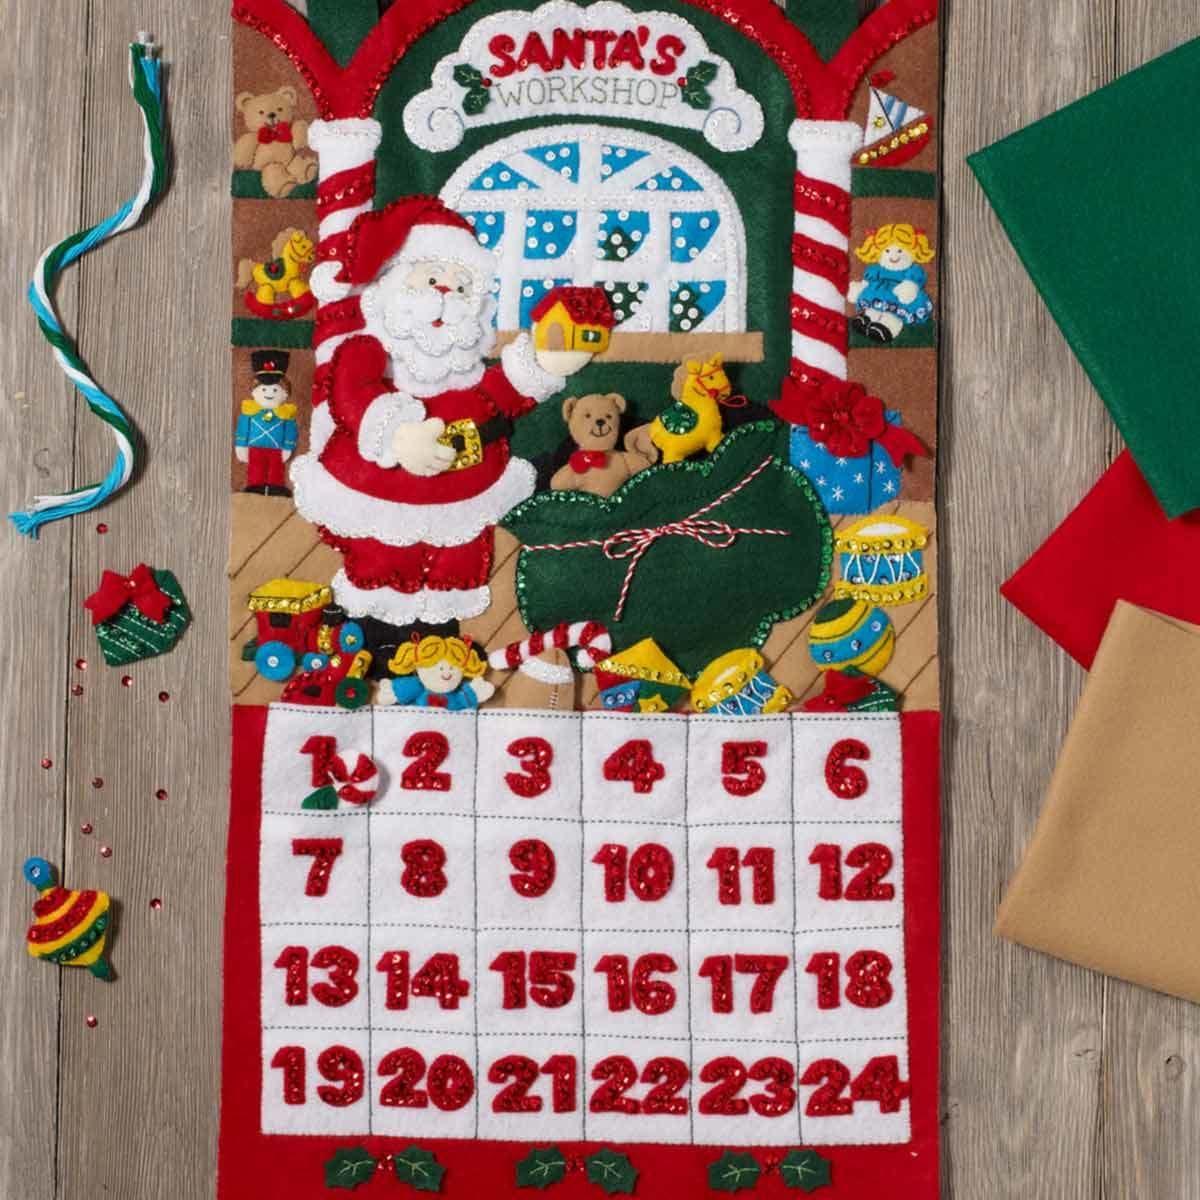 「Santa's Workshop Advent Calender」Bucilla ブシラ クリスマス ハンドメイド フェルト    アドベントカレンダー キット